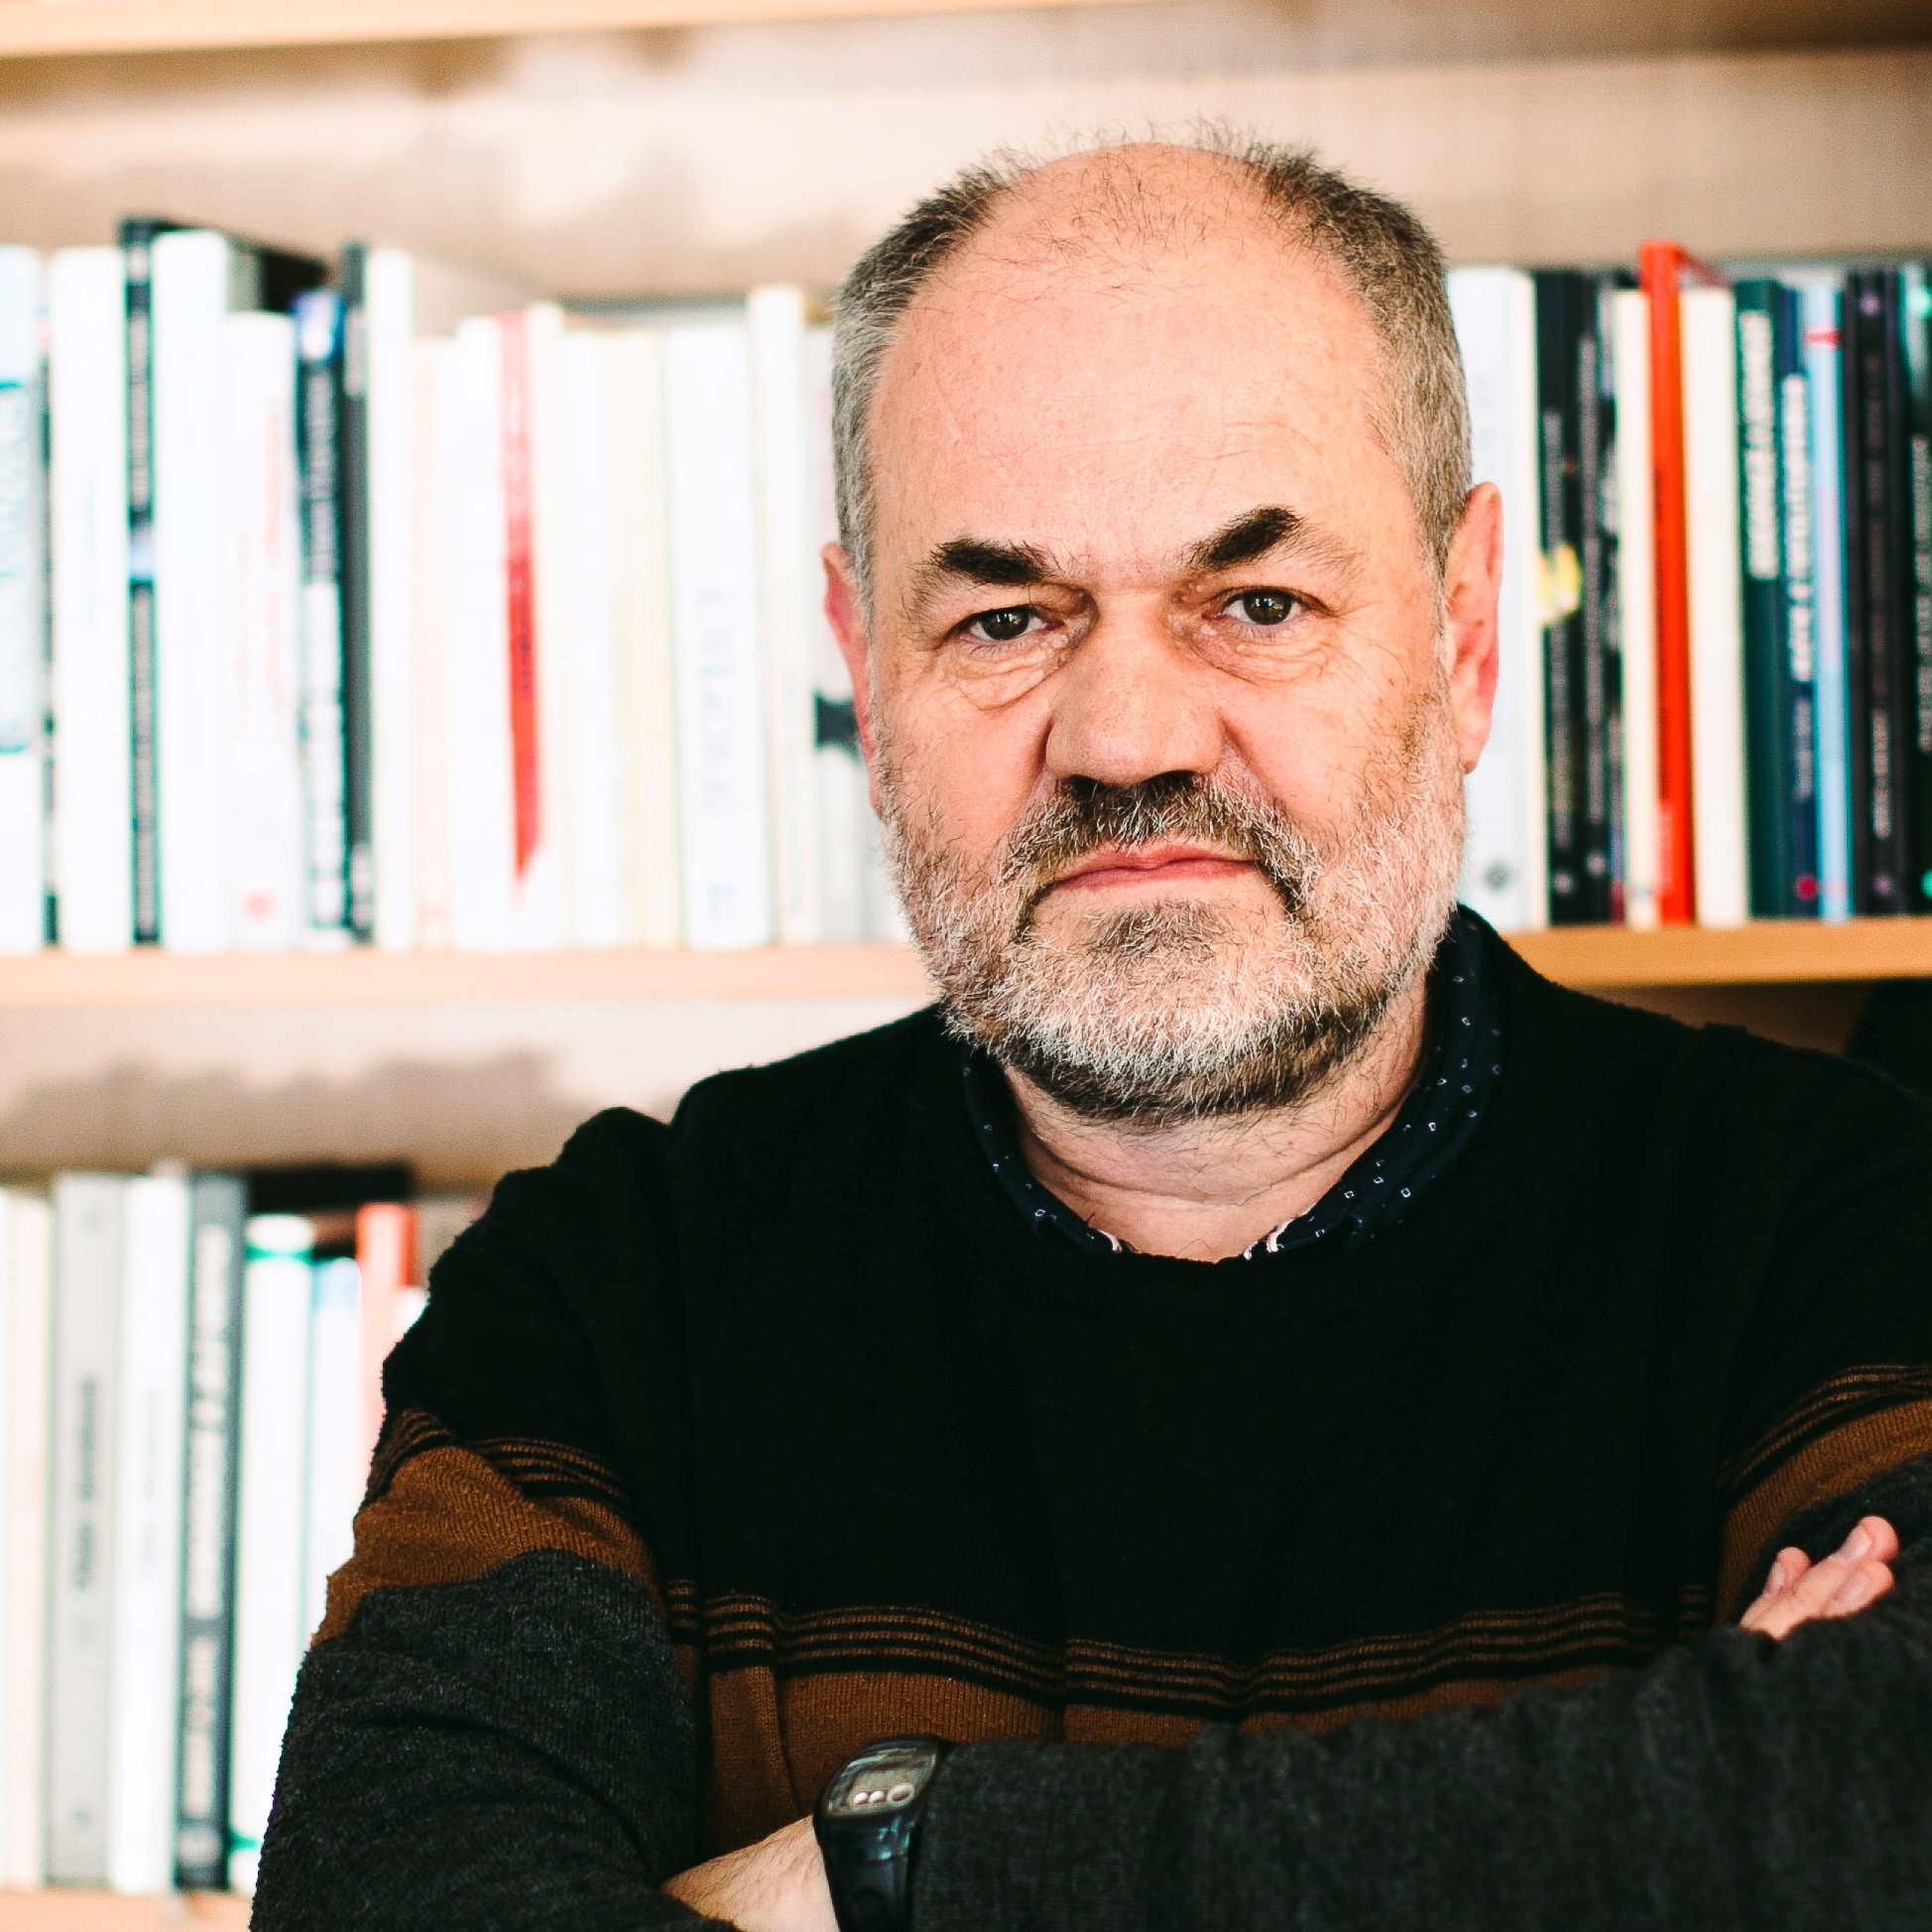 Dušan Ondrušek / Senior tréner, konzultant